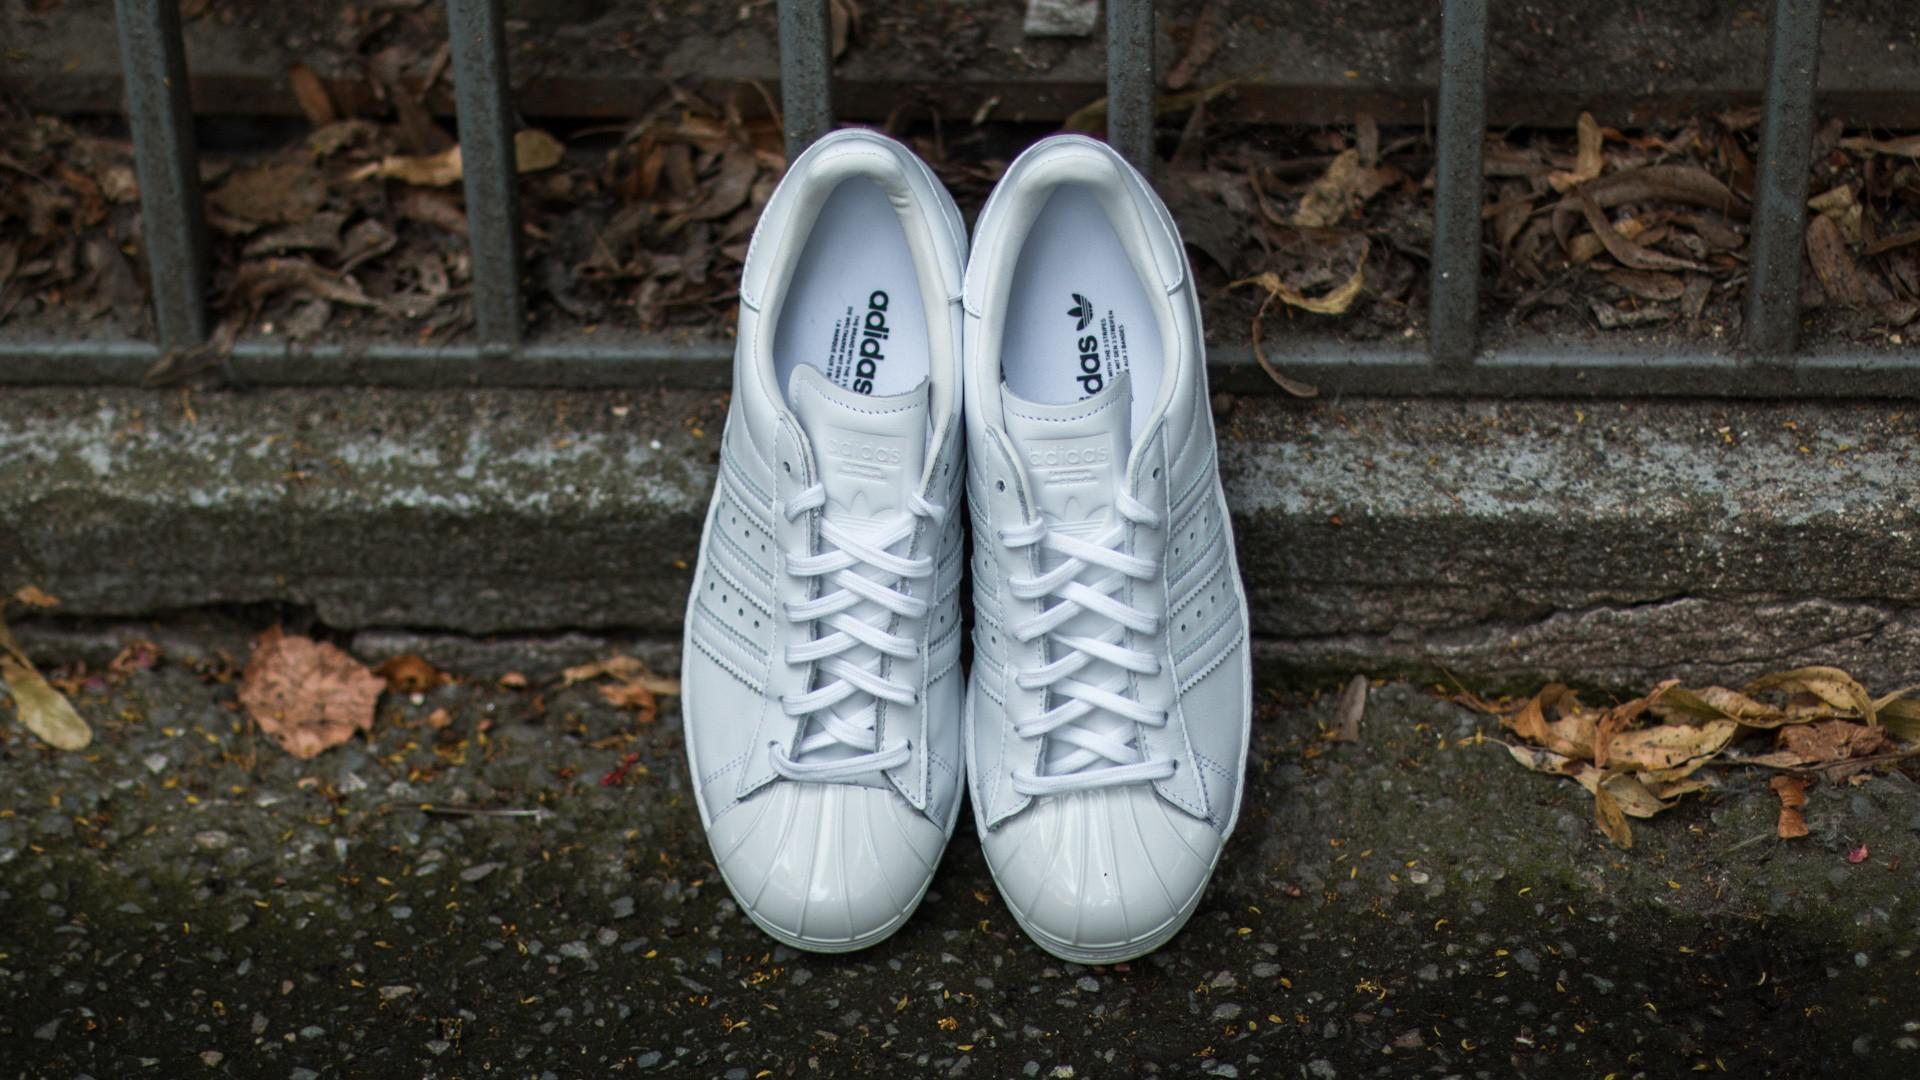 c8cc185b53eb Lyst - adidas Originals Adidas Superstar 80s Metal Toe W Ftw White ...